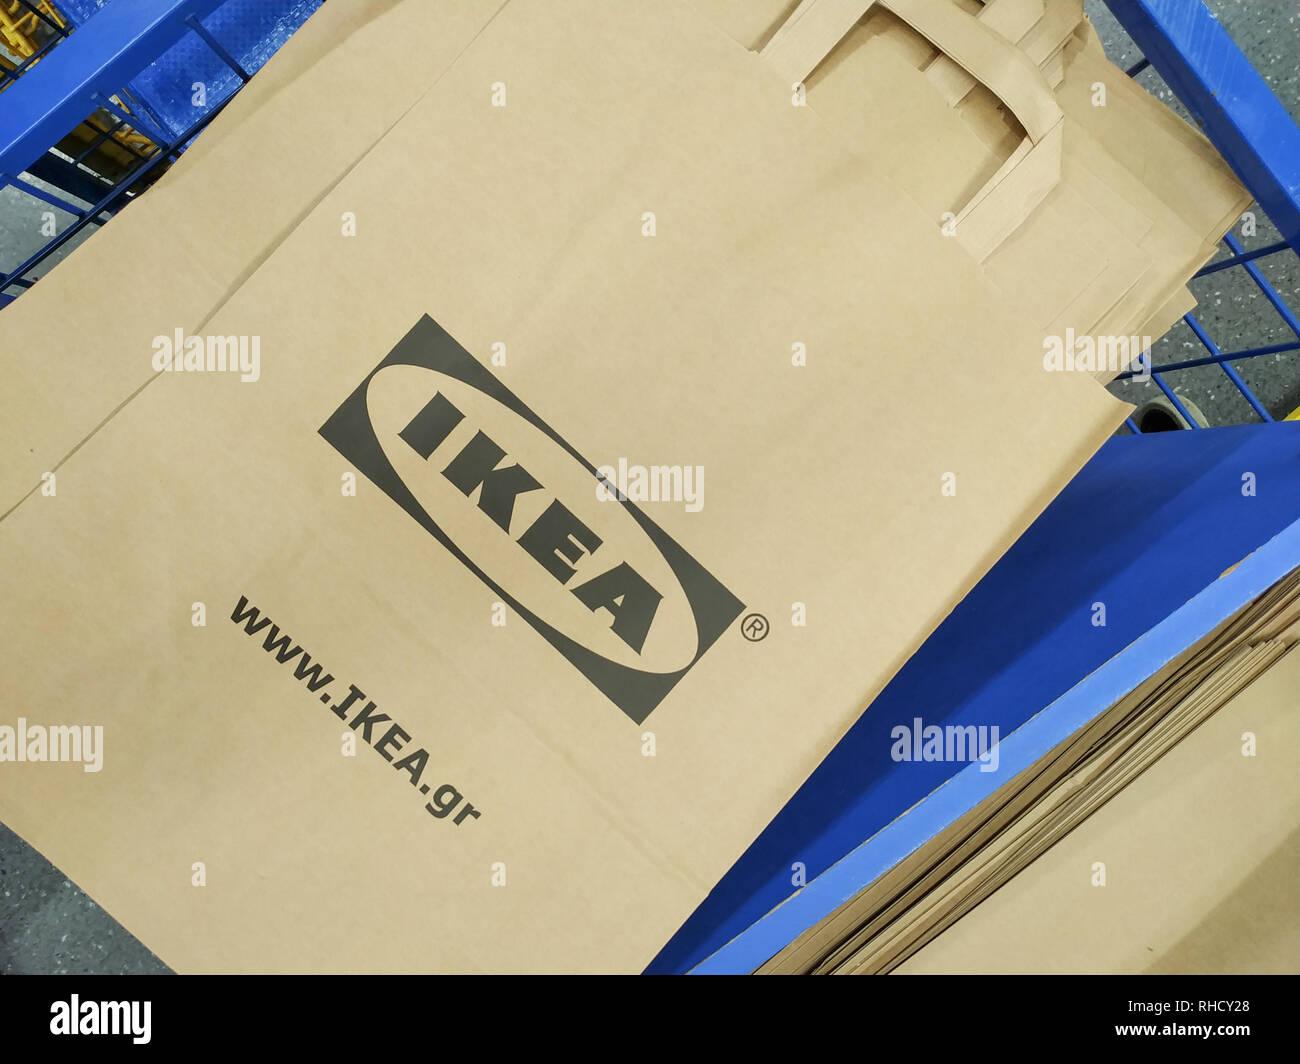 Ikea Product Stock Photos Ikea Product Stock Images Alamy